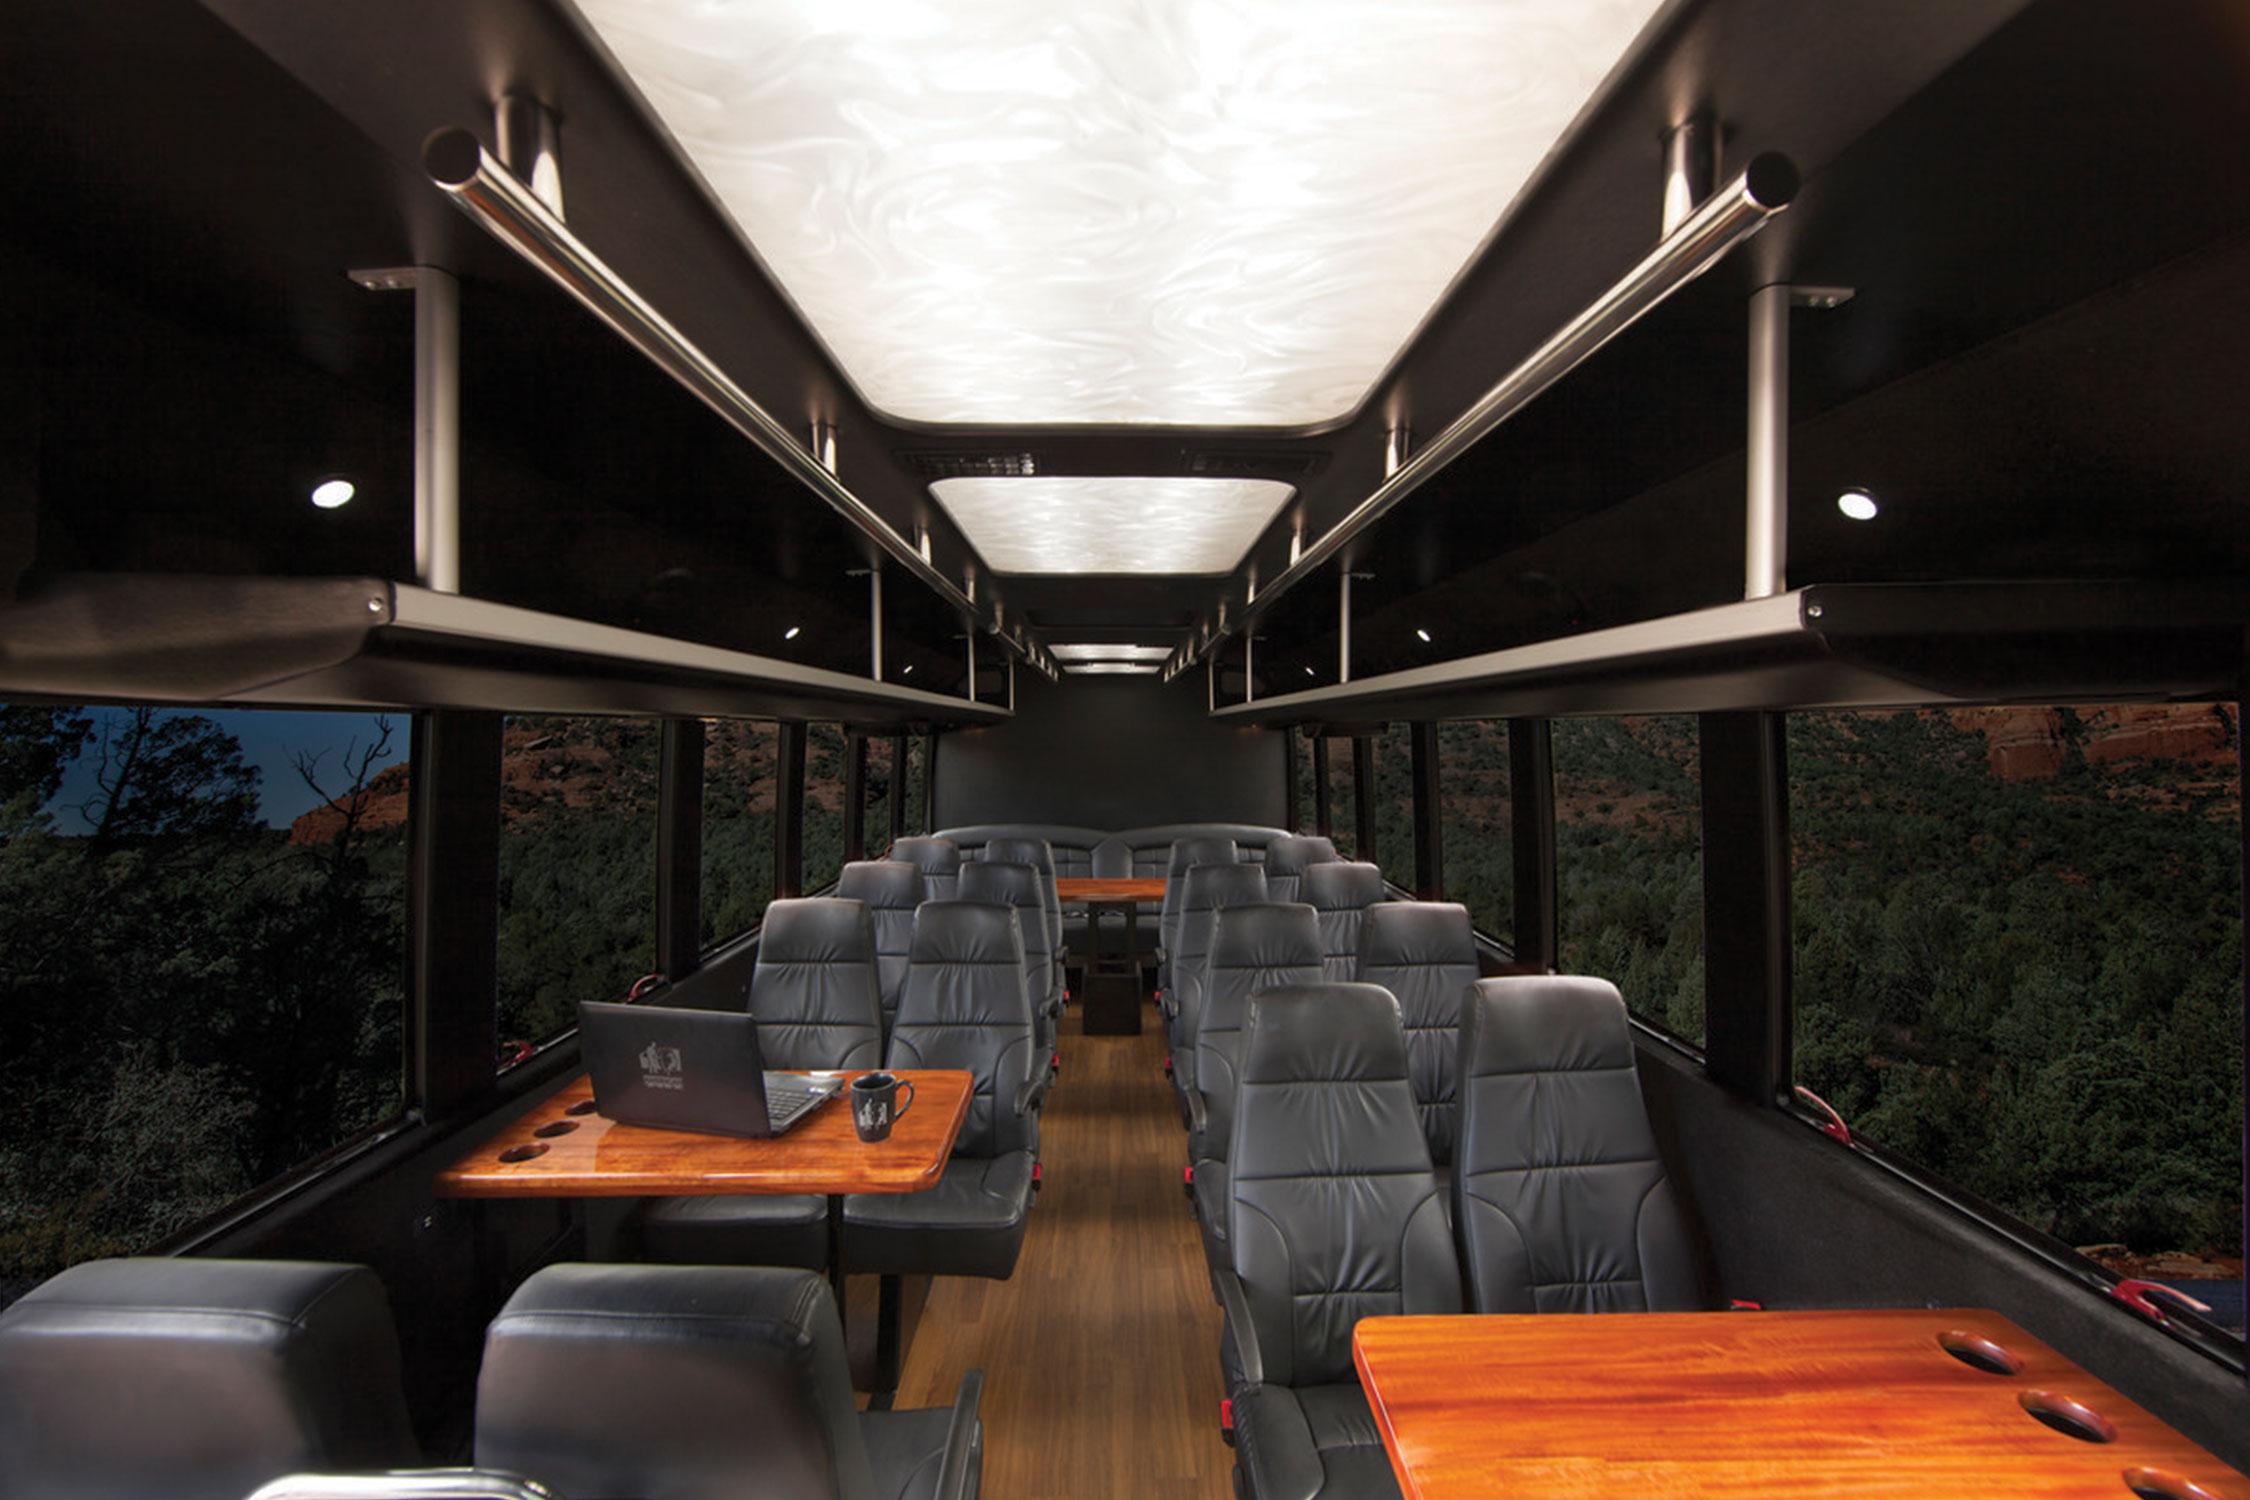 Phoenix Charter an Shuttle Services - American Valet